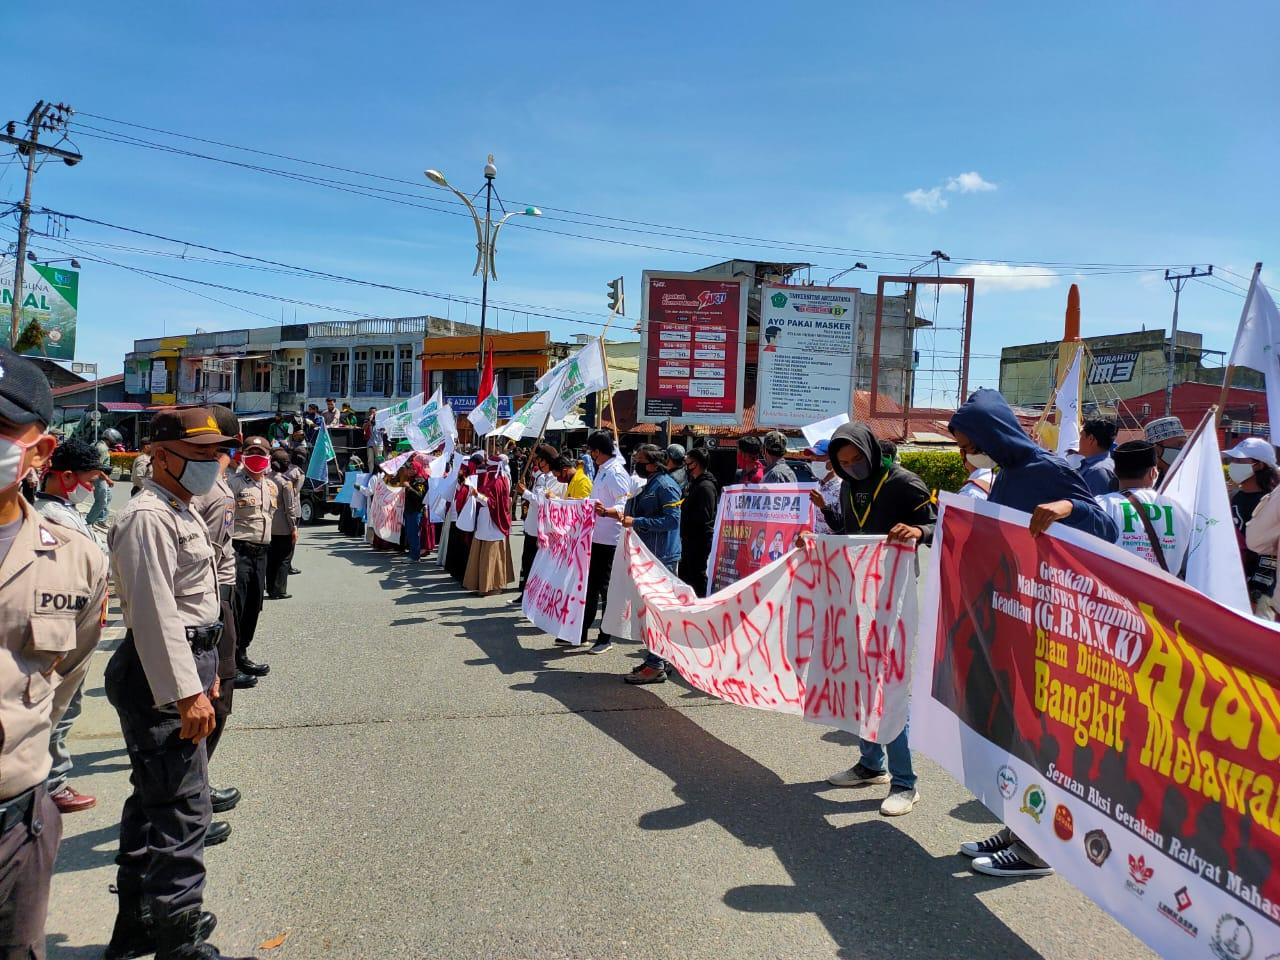 Gelar Aksi, KAMMI Daerah Aceh Barat Tegas Tolak RUU HIP